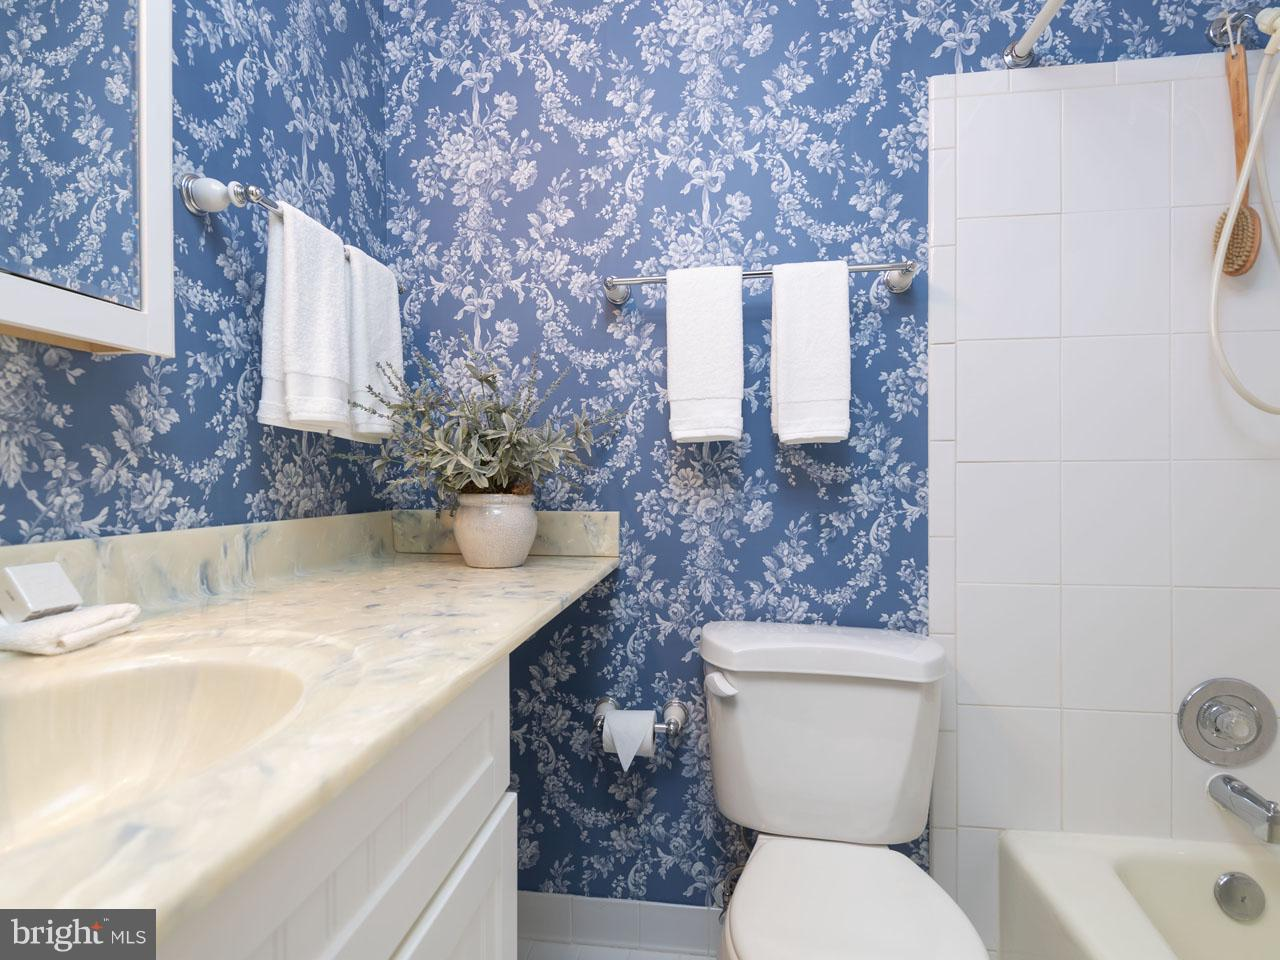 1010014728-300953035517-2021-09-05-13-50-25  |   | Annandale Delaware Real Estate For Sale | MLS# 1010014728  - Best of Northern Virginia